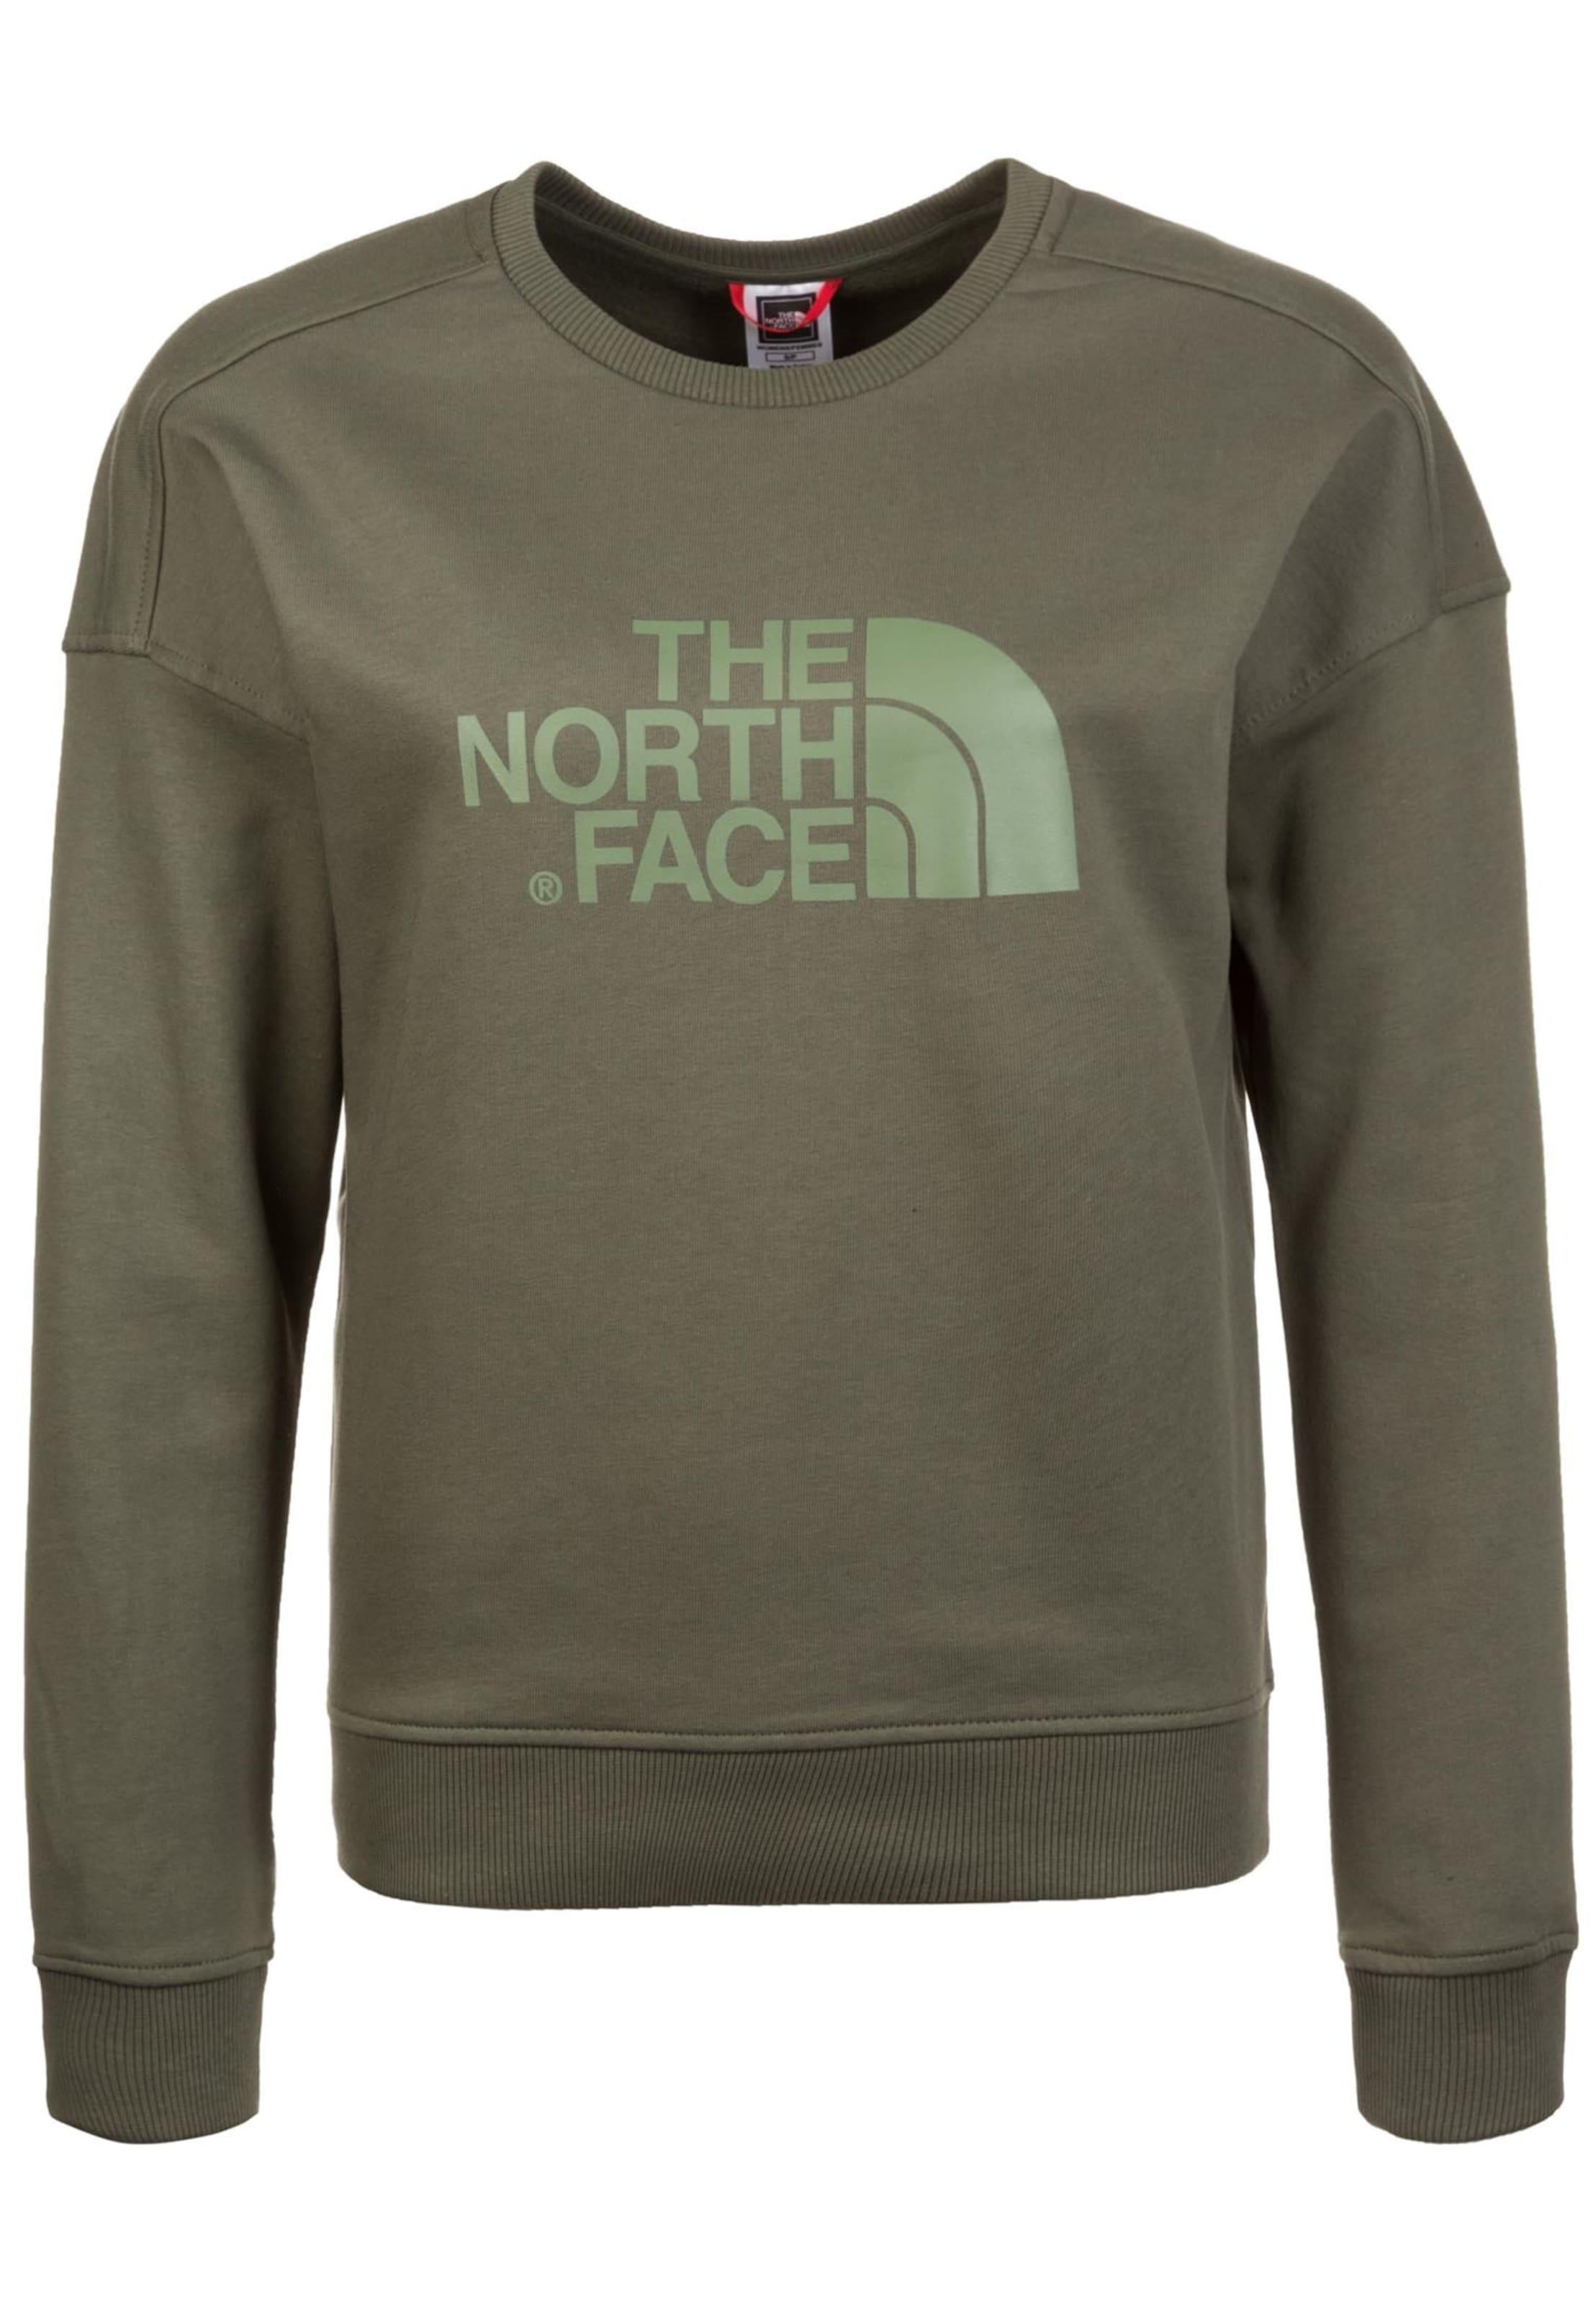 Sweat En Face 'drew shirt North OlivePomme Peak' The j5qL34ARc